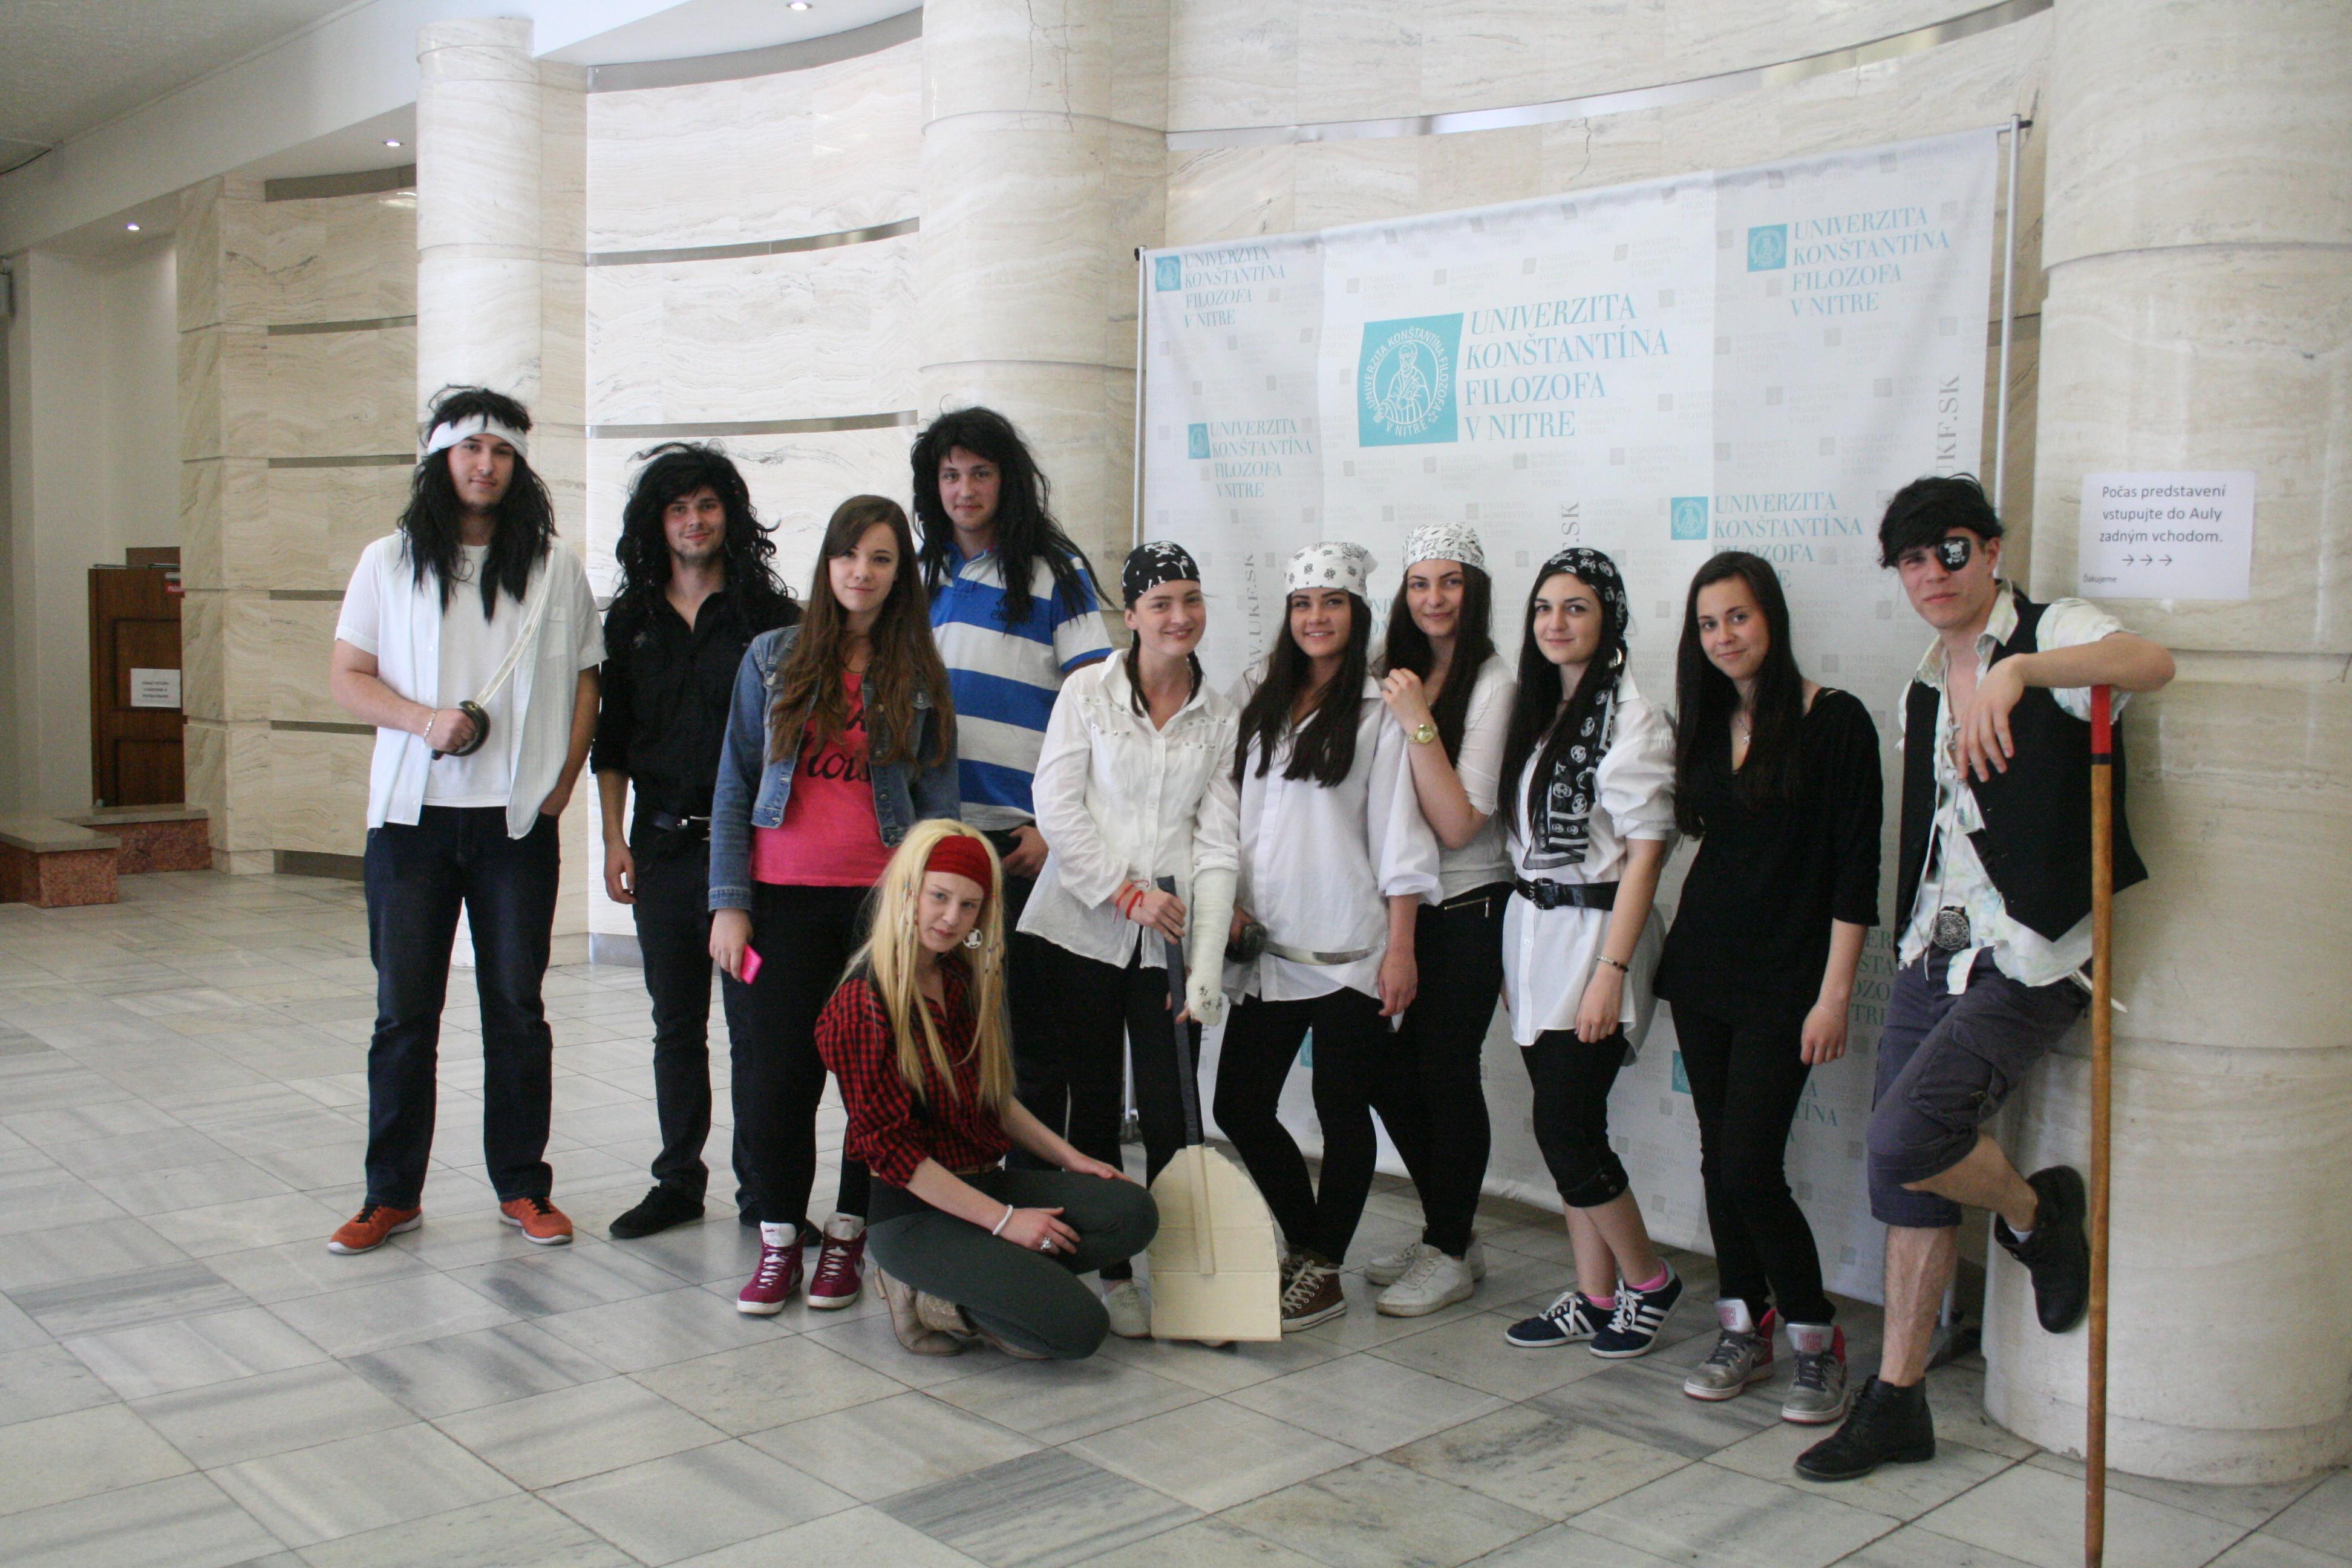 Študenti z Nitry uspeli na divadelnom festivale - Kariéra  c7da908c0a1